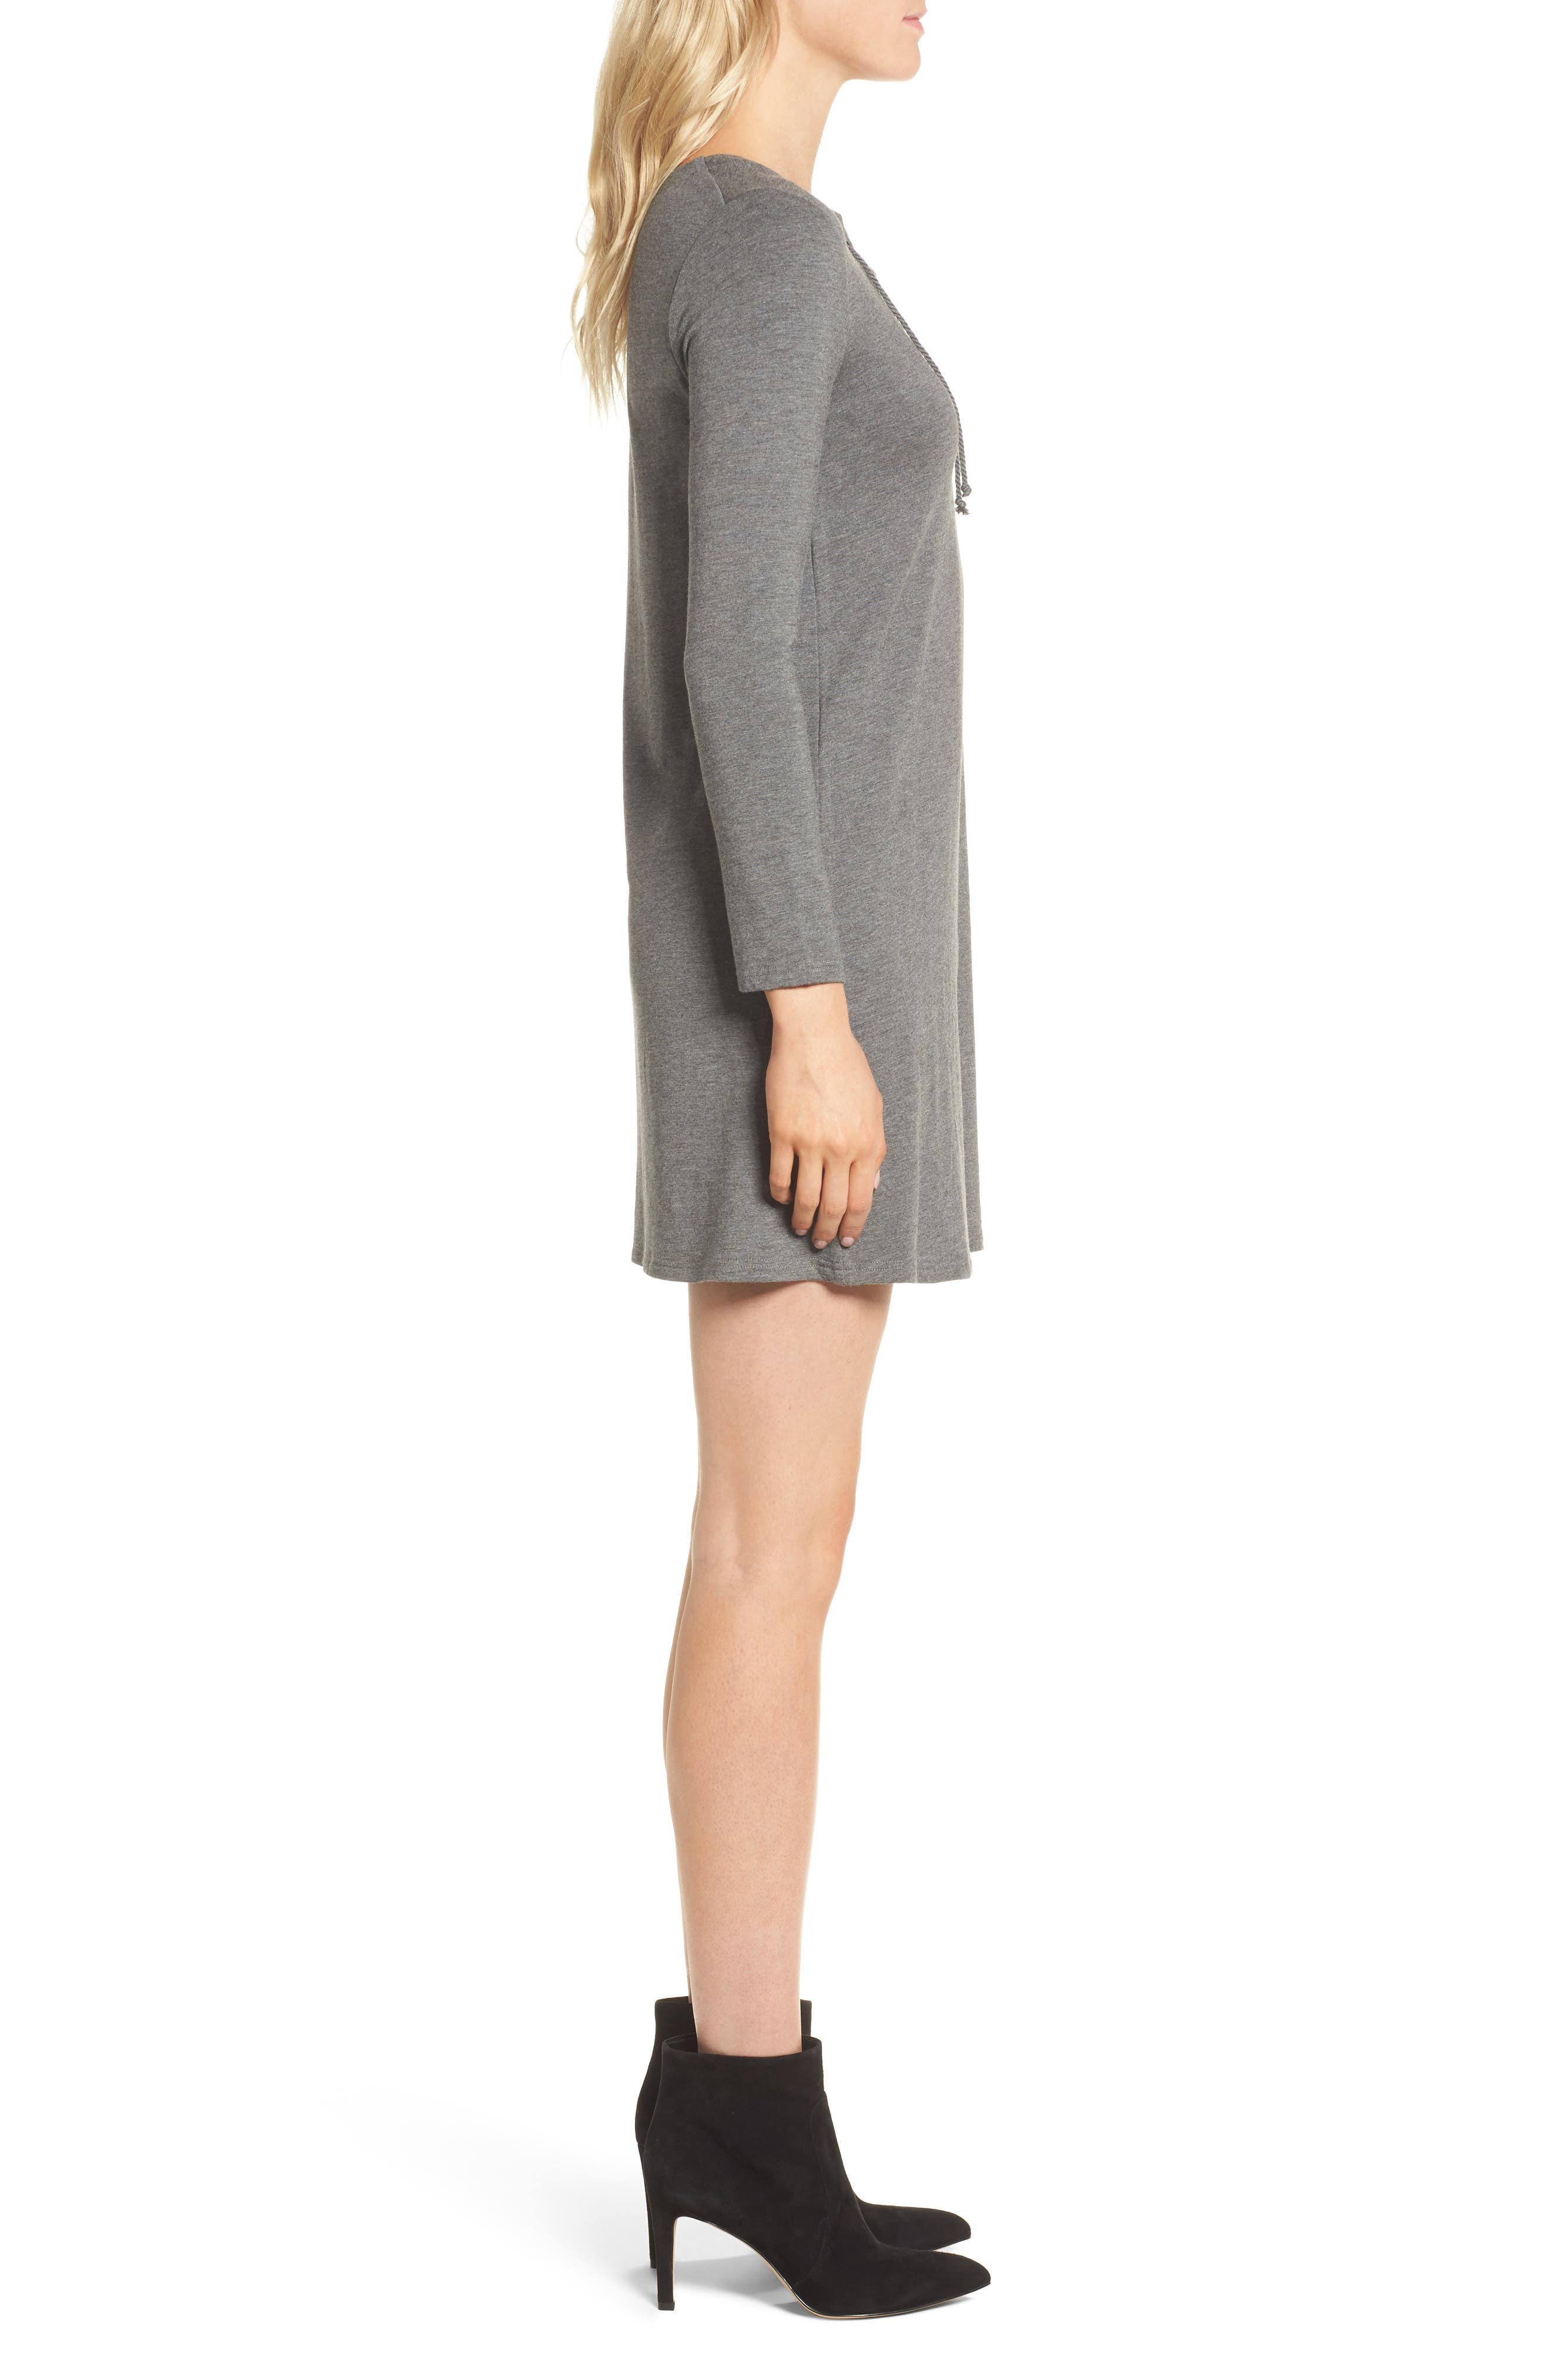 Celerina Lace-Up Minidress,                             Alternate thumbnail 3, color,                             Med Heather Grey